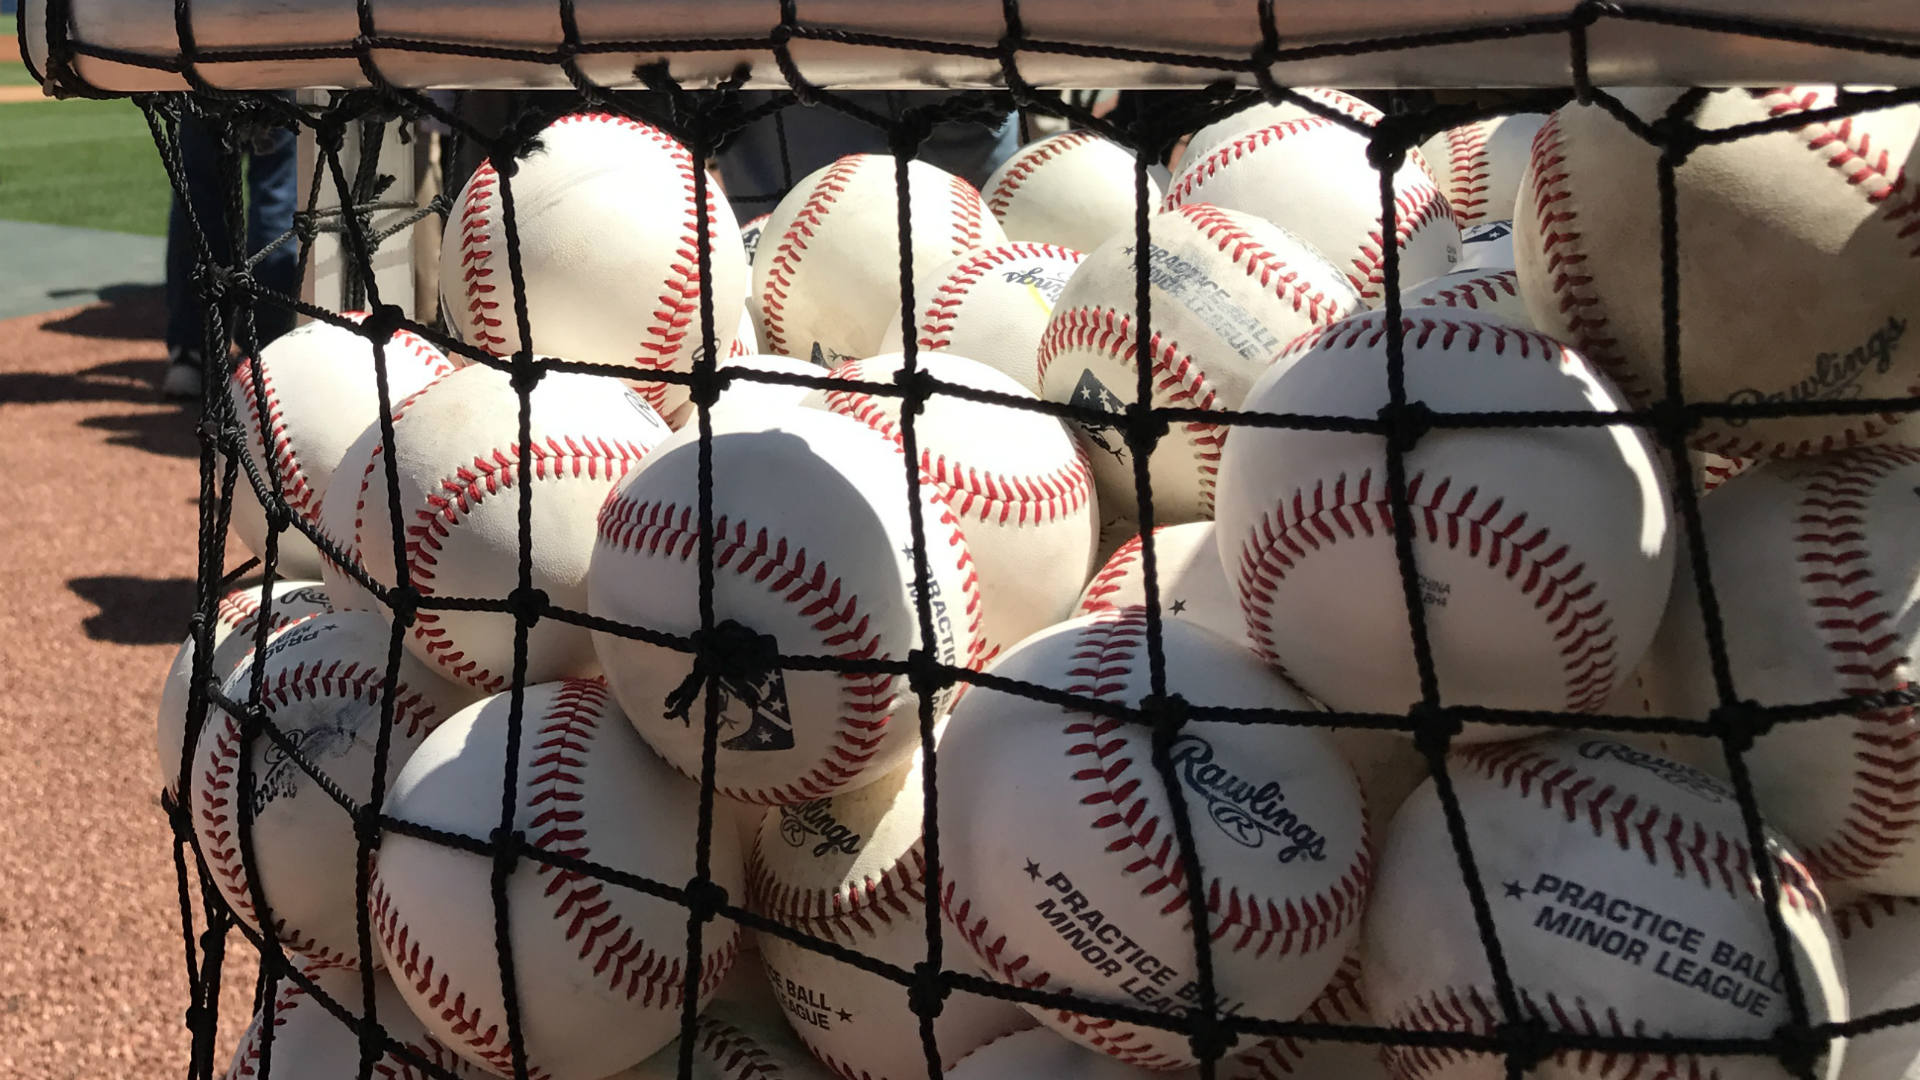 Minor League Baseball warns of financial doom after 2020 season canceled